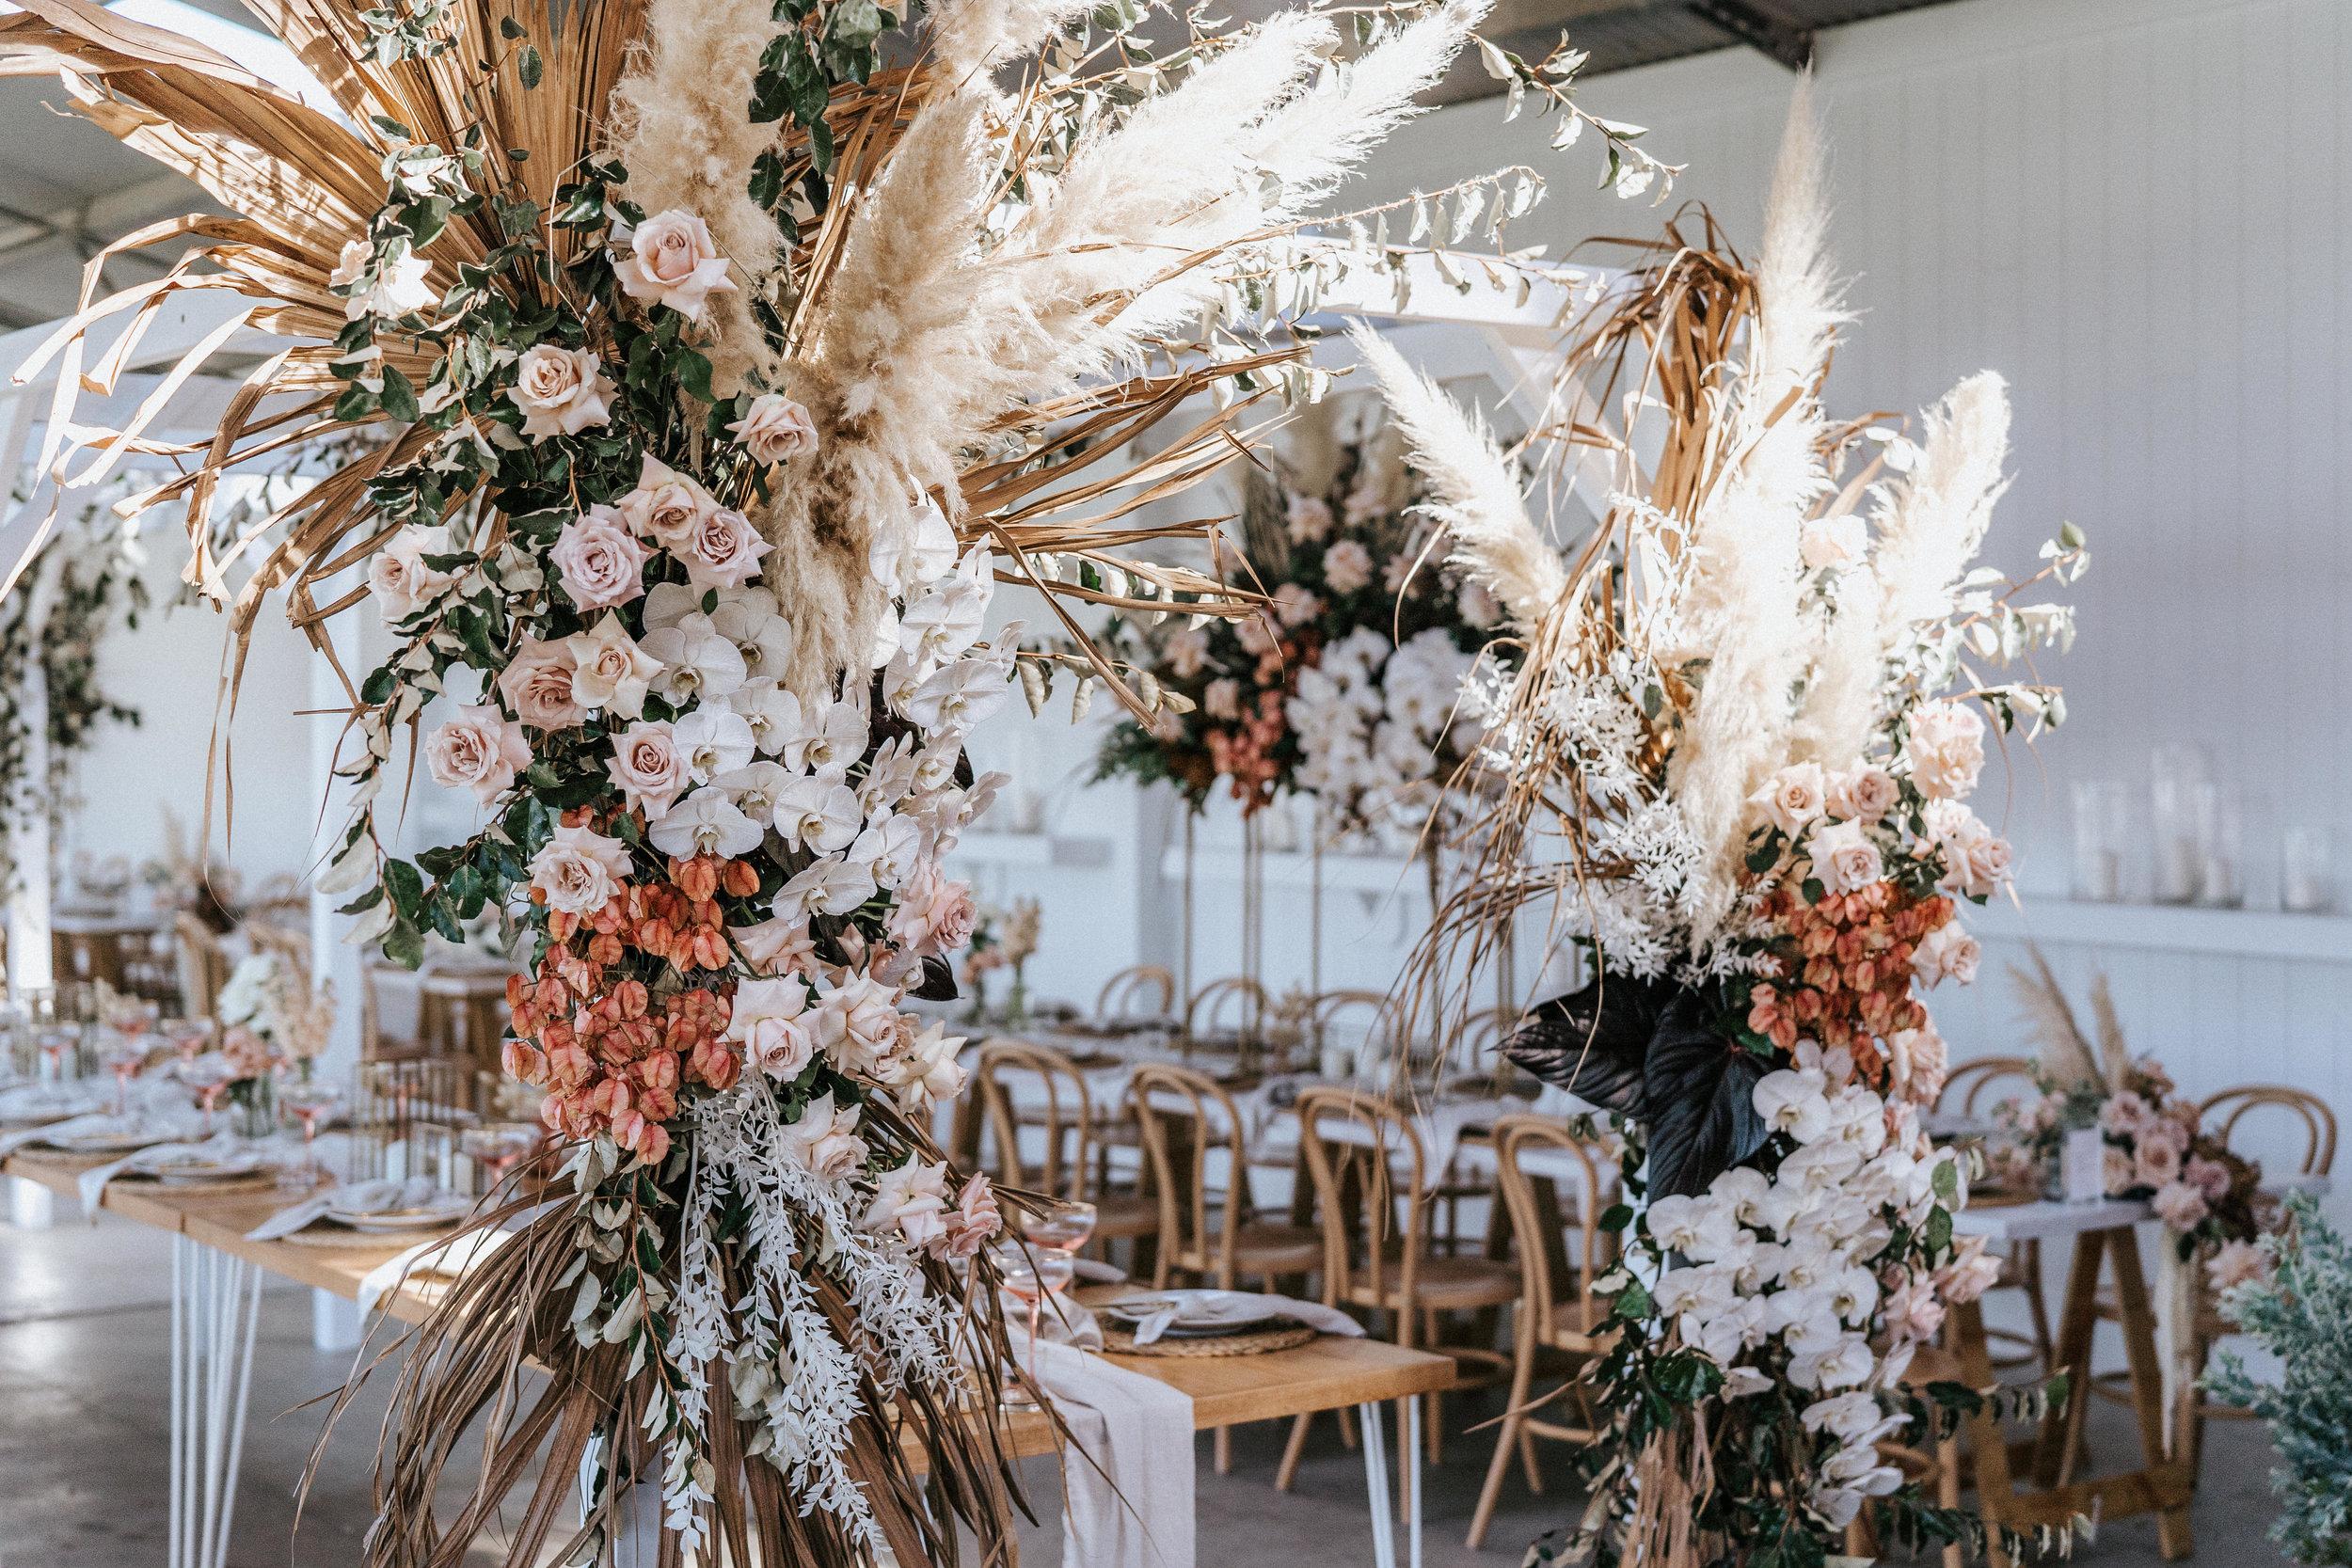 gemaya-tim-bilmon-wedding-113.jpg